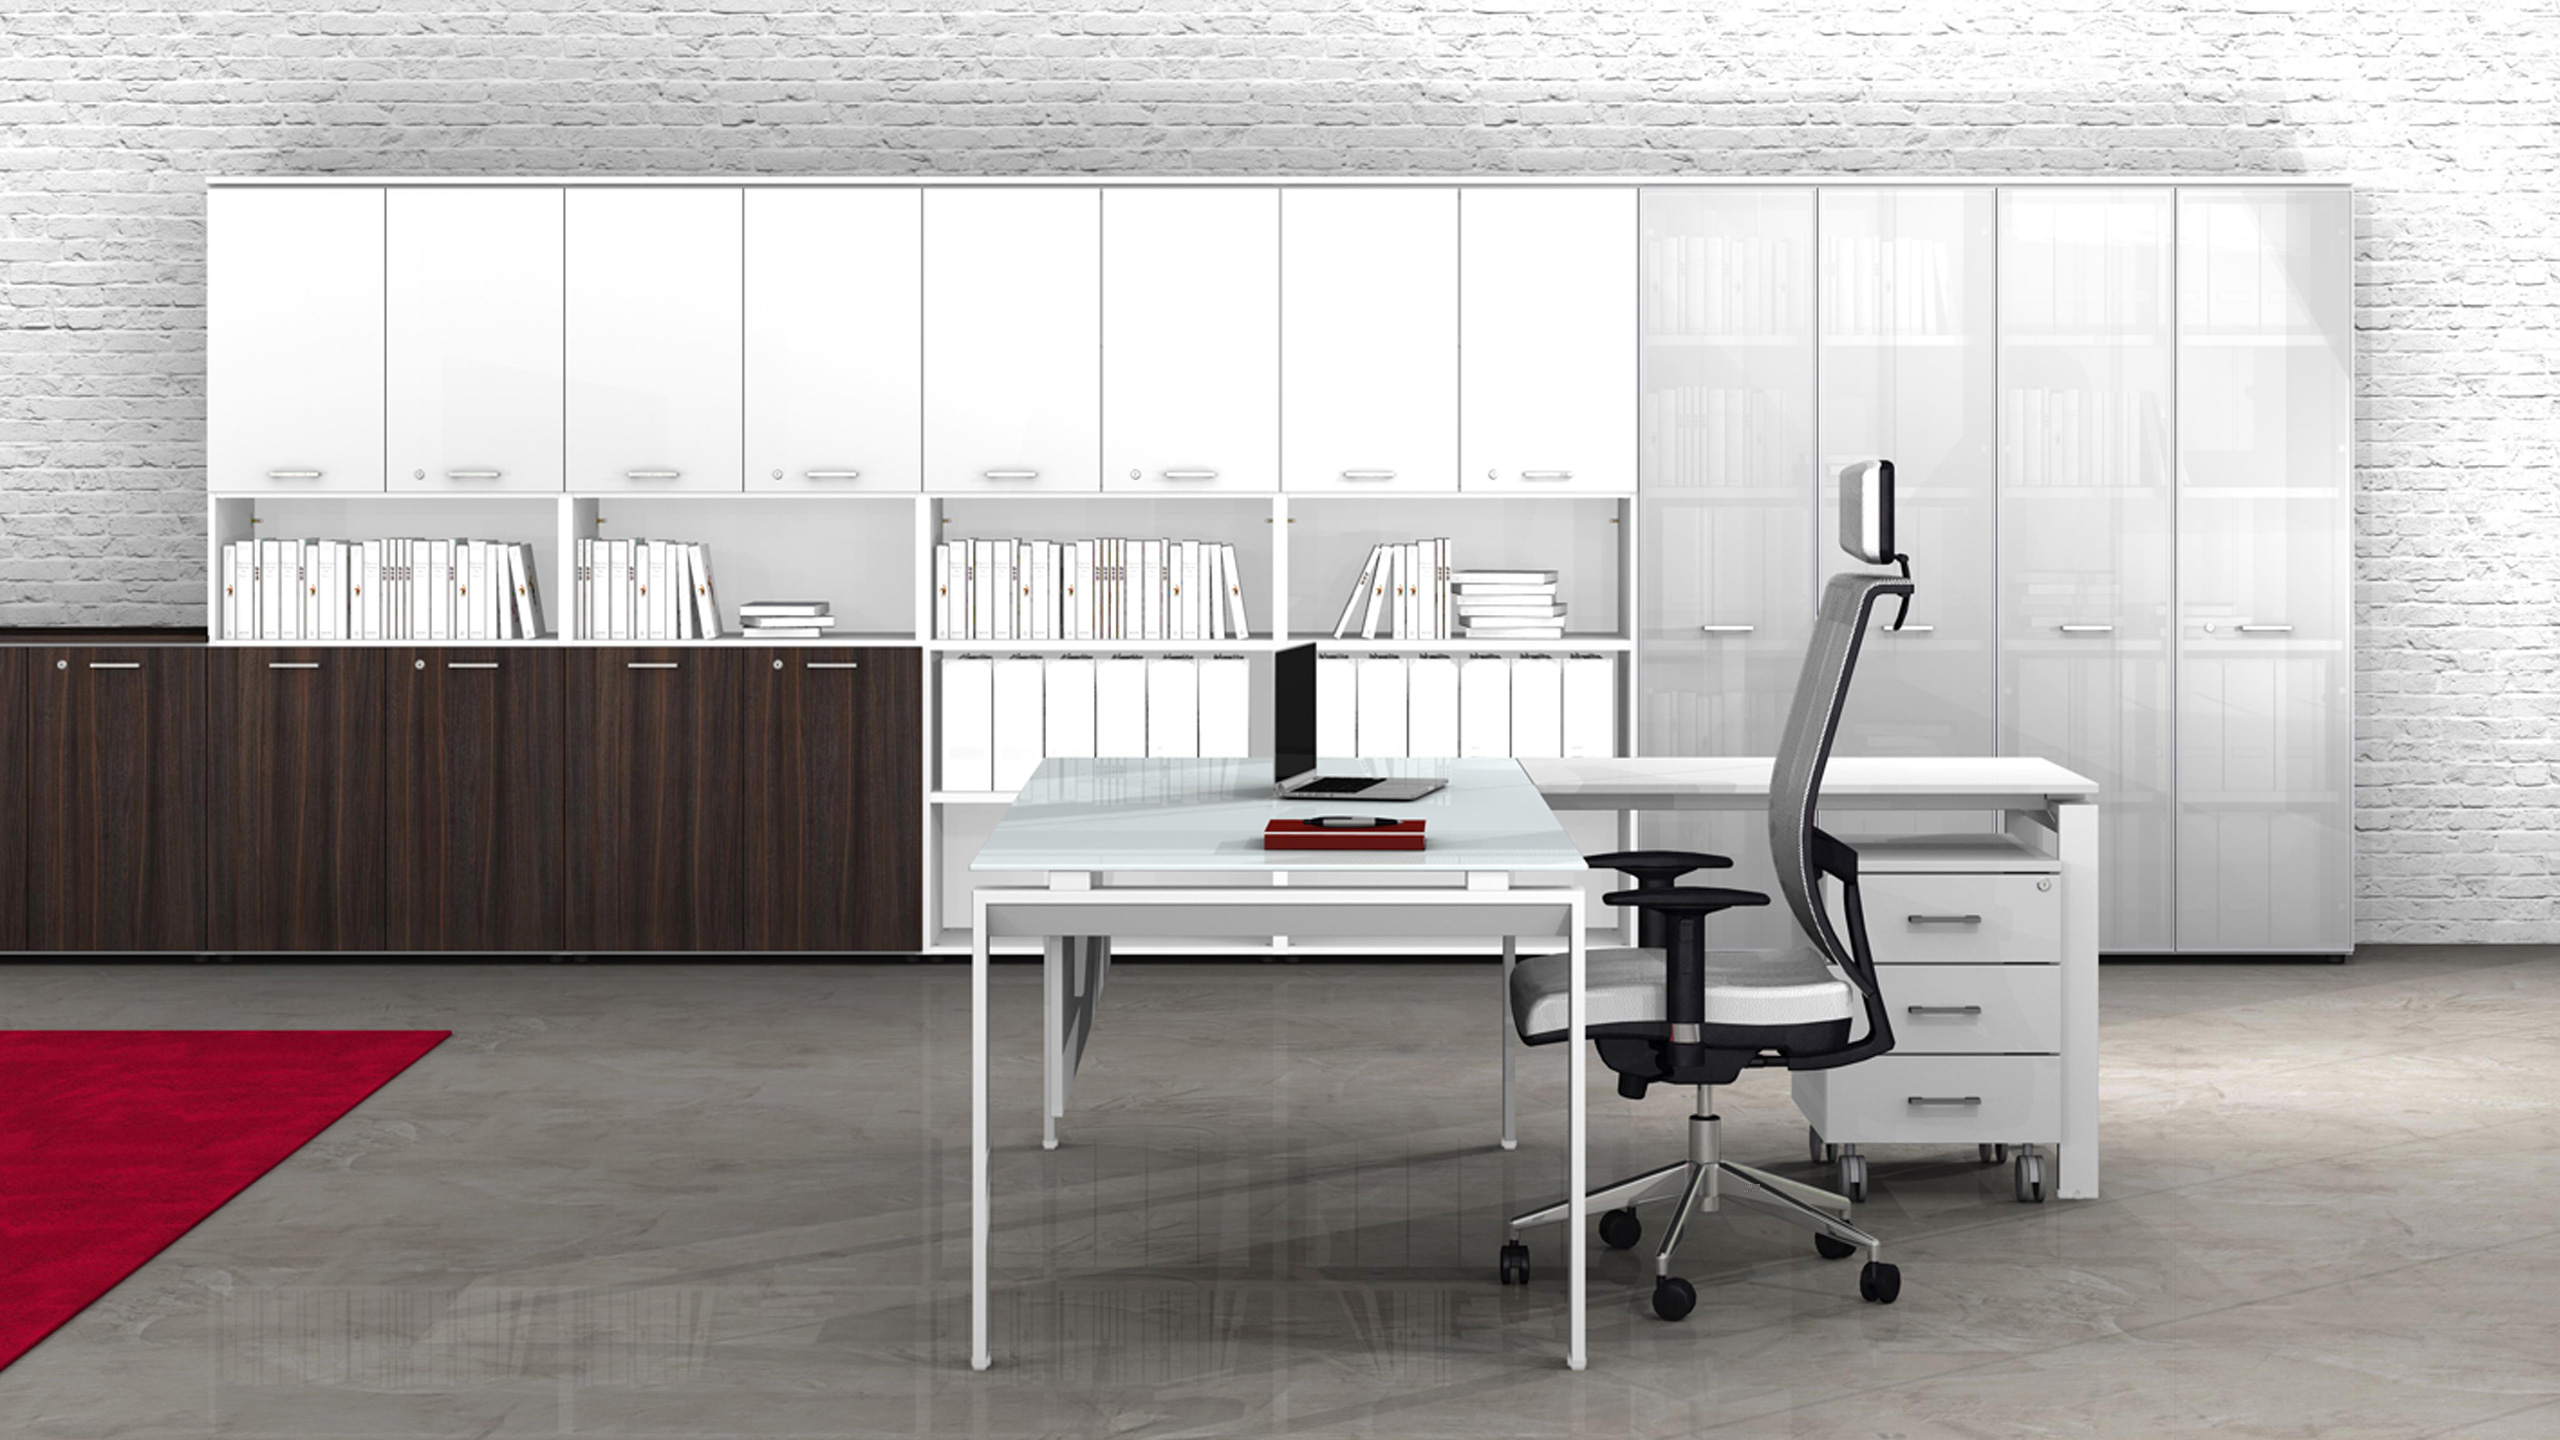 Mobili per ufficio Terni - FUMU